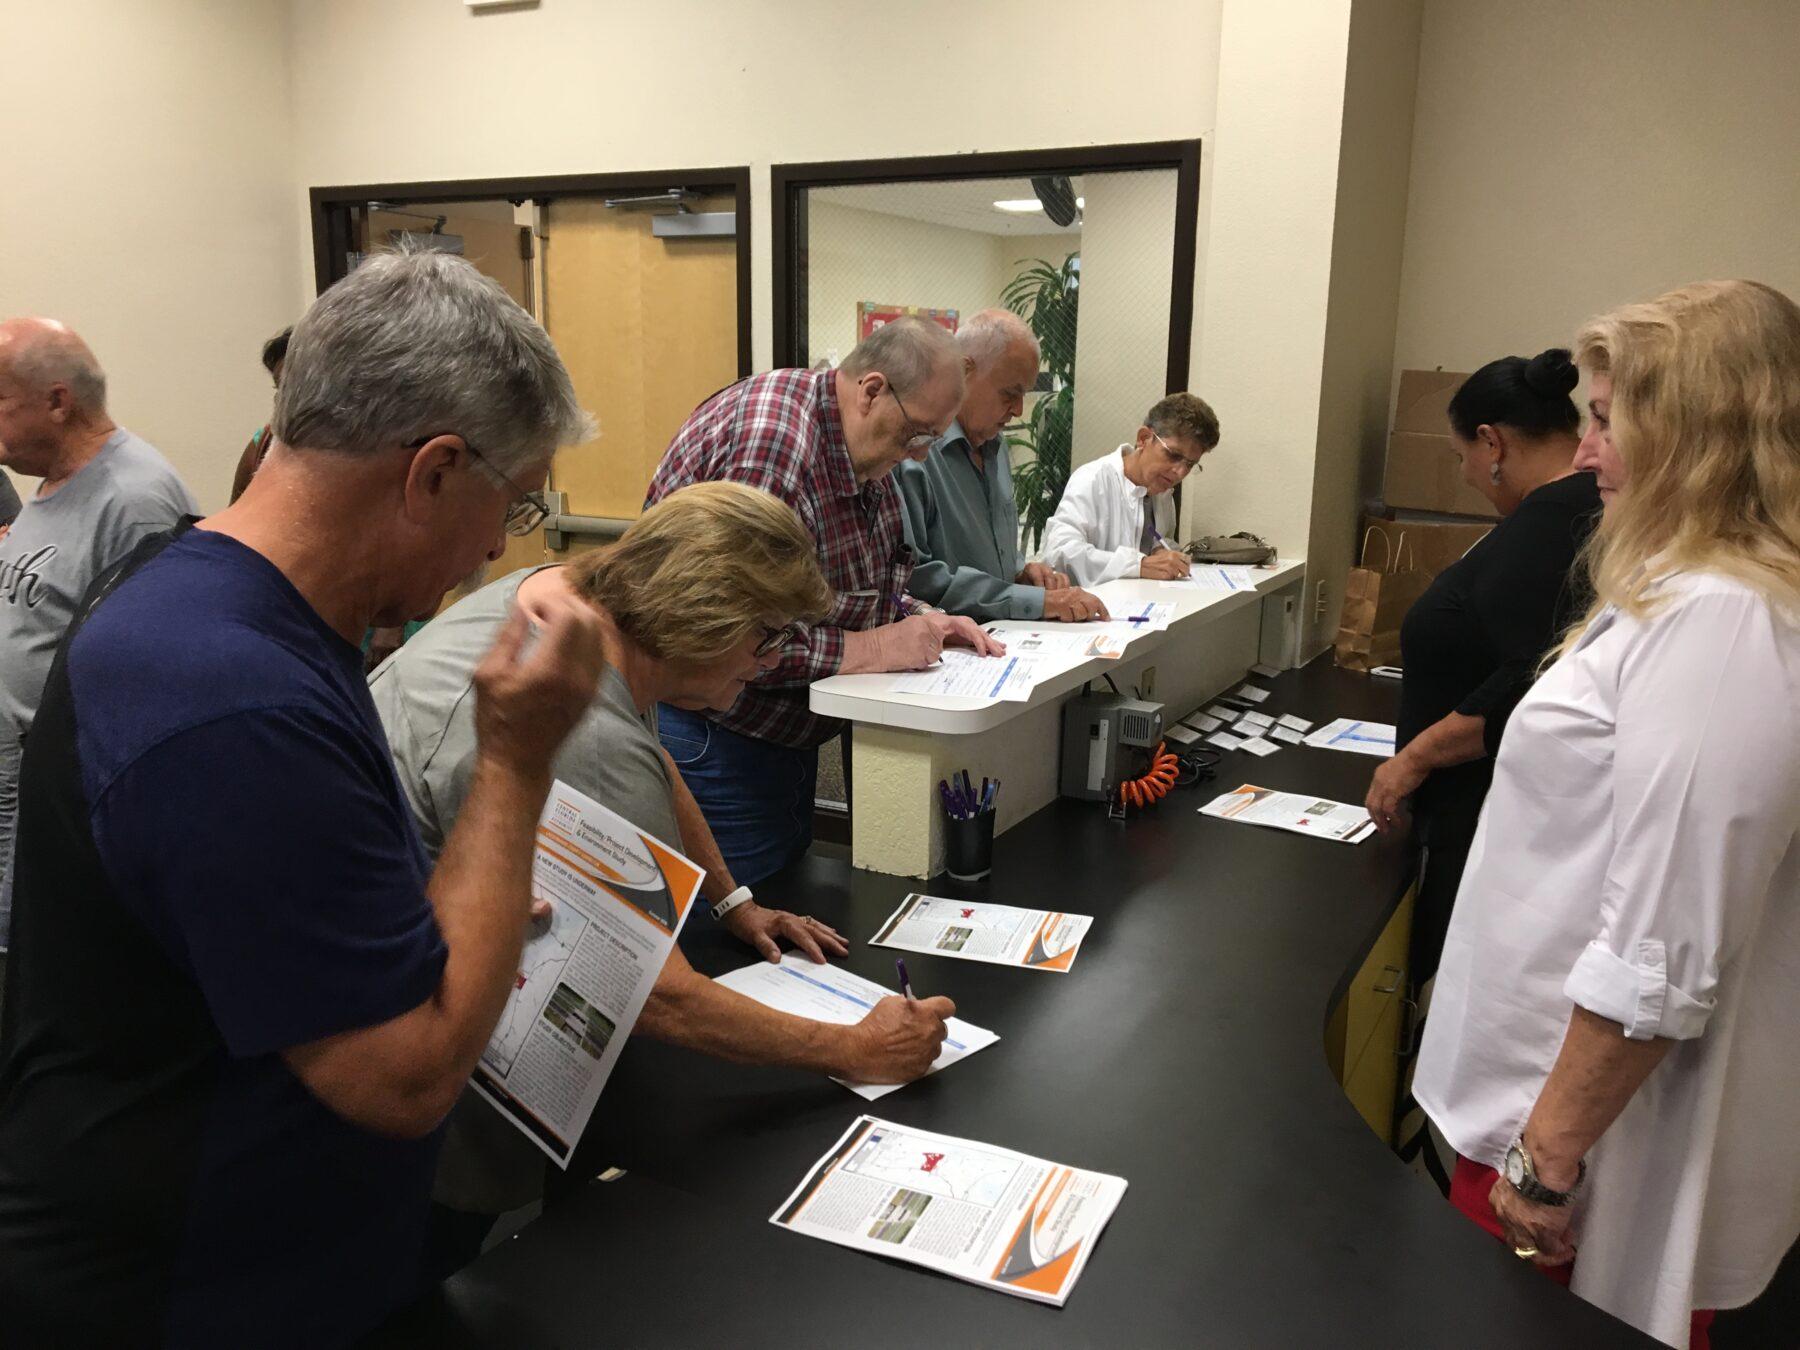 August 30, 2018 Public Meeting